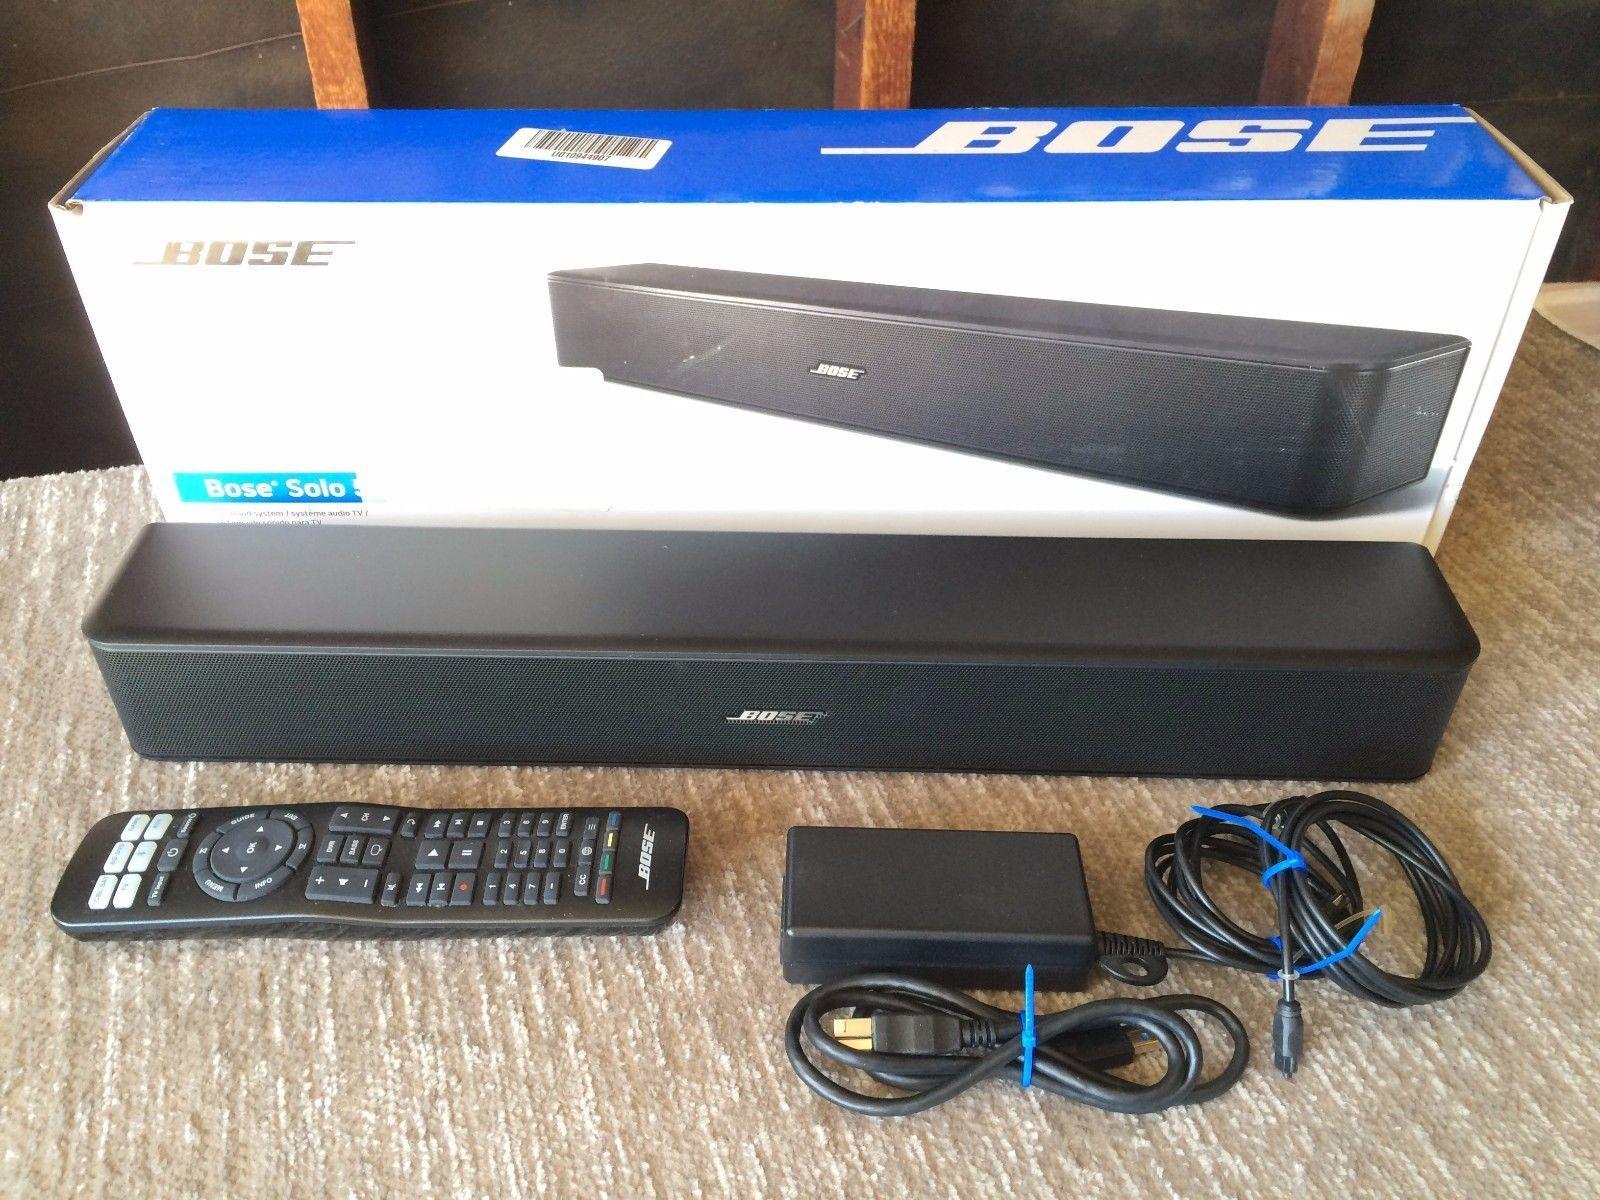 Bose Solo 5 Tv Sound Bar System Bluetooth Connectivity Stream Music Wirelessly Bose Soundbar Speaker Shop Our Shop Soloing Ebay Bluetooth